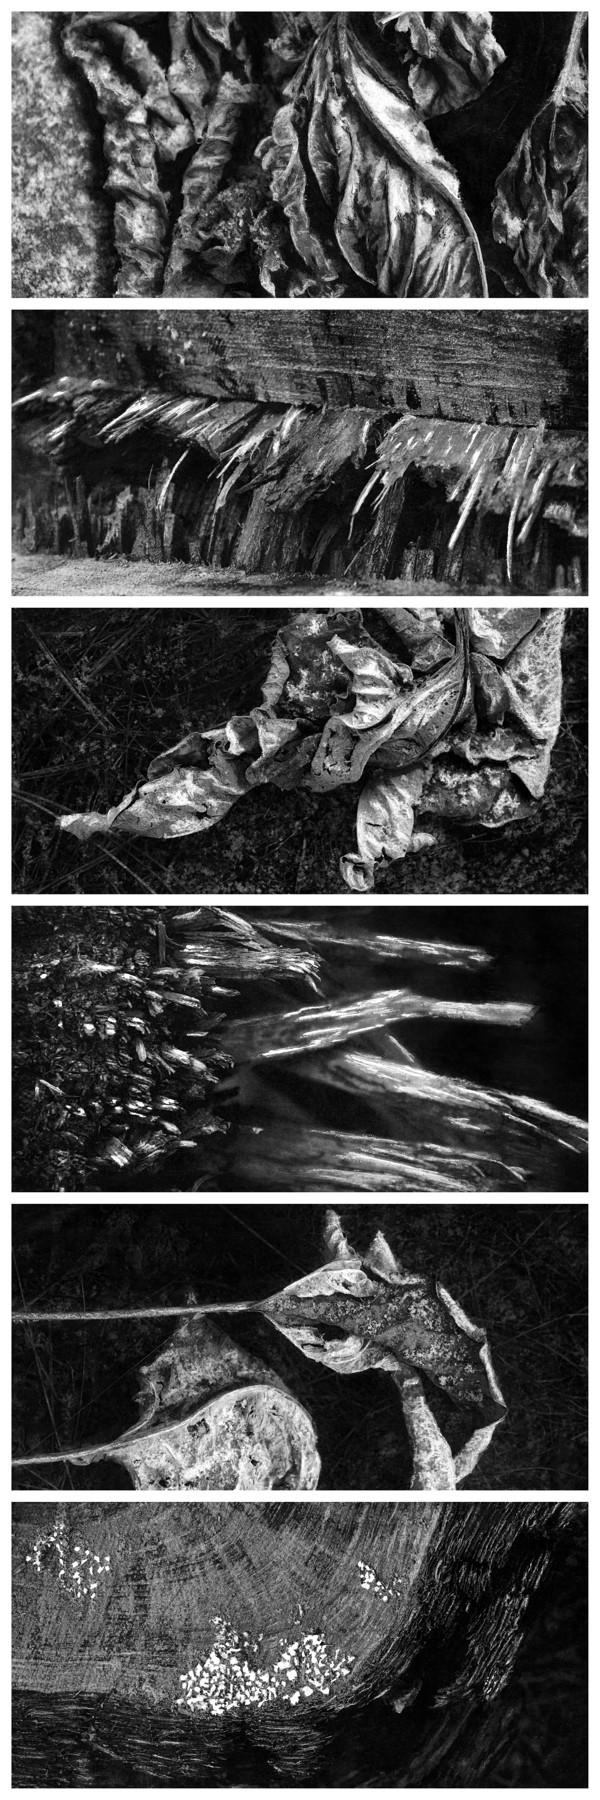 Ars Dormiendi (The Art of Sleeping)